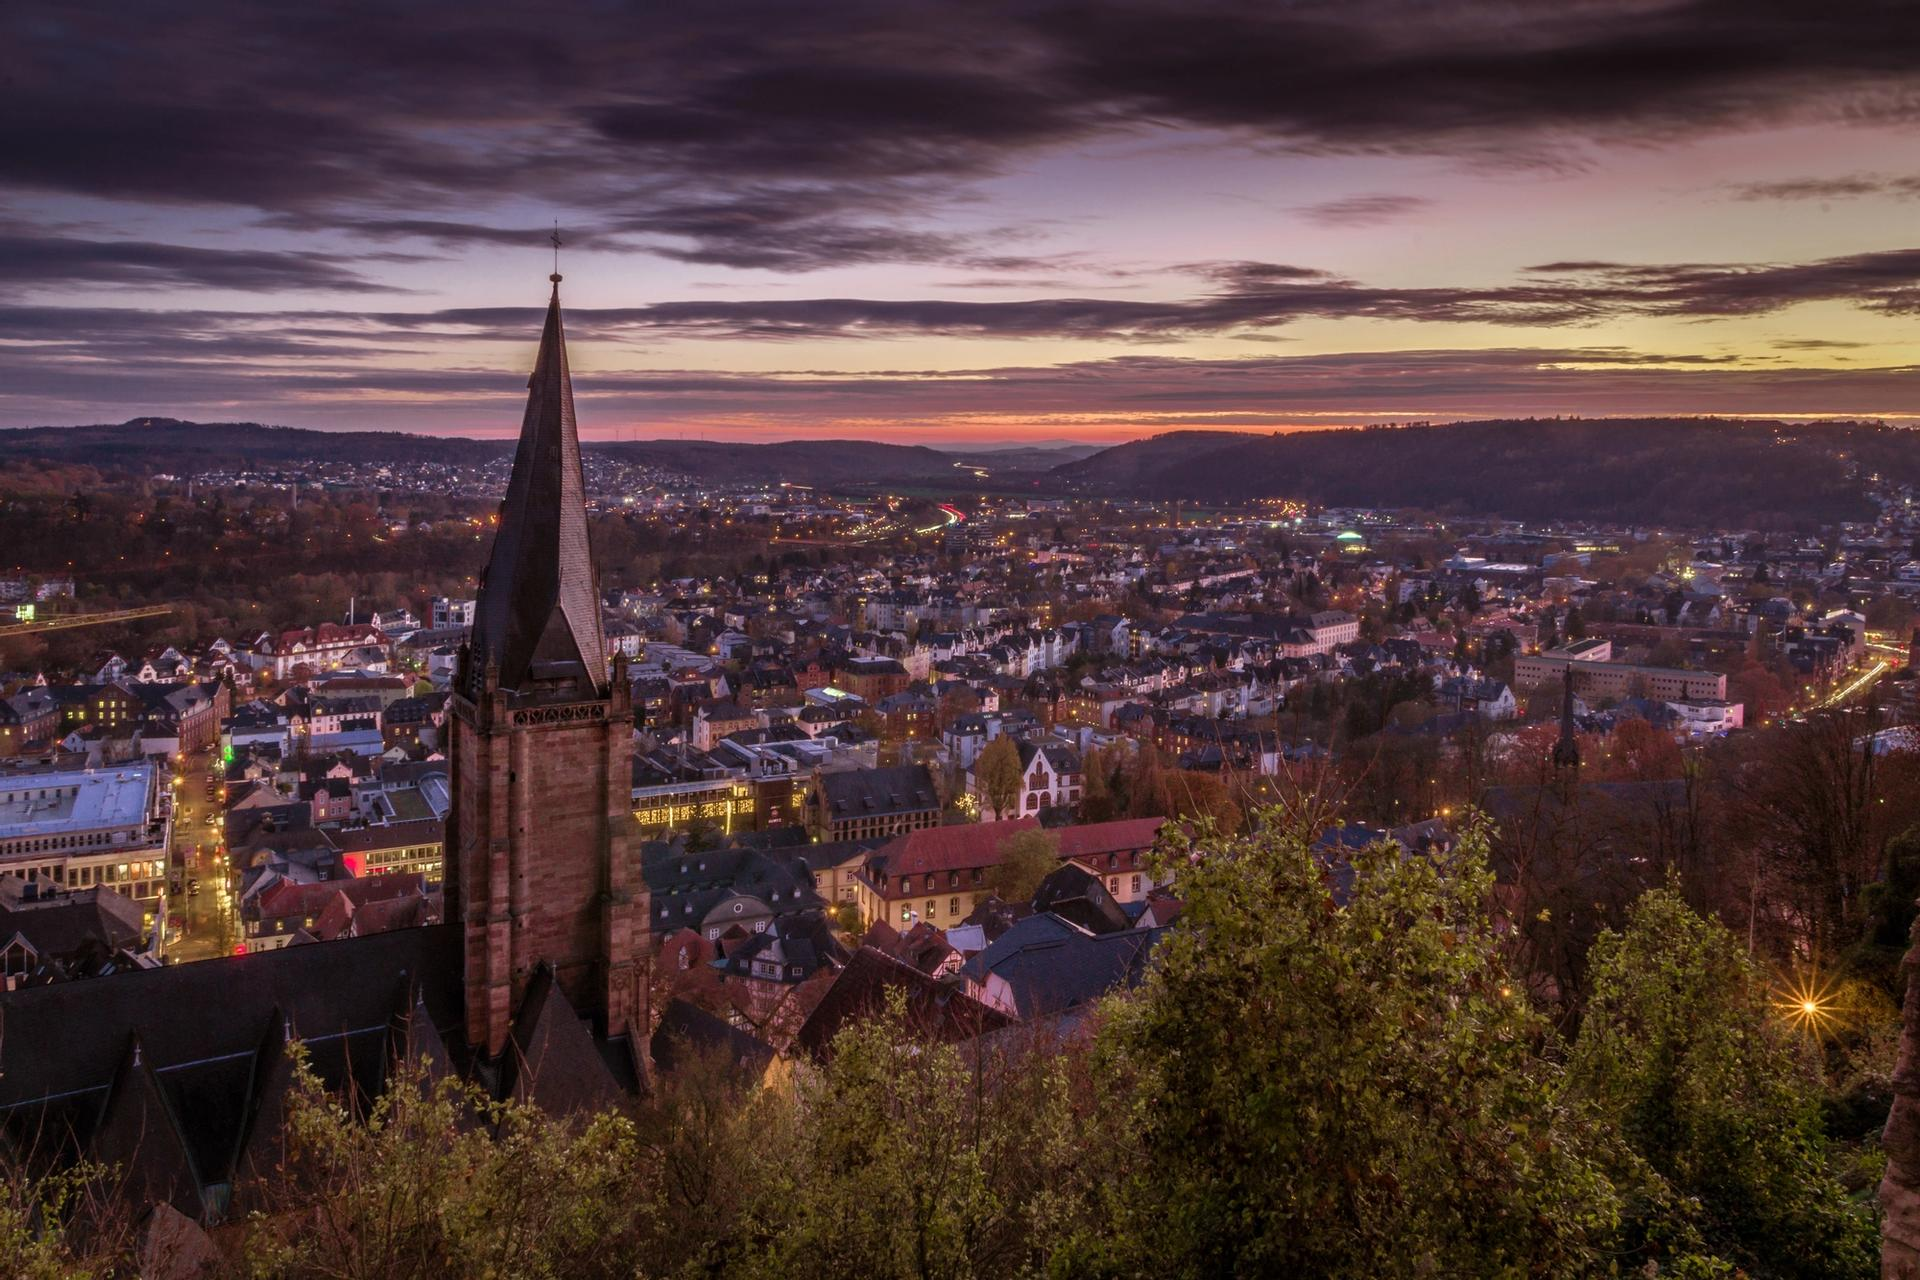 Anticimex Kammerjäger in Marburg